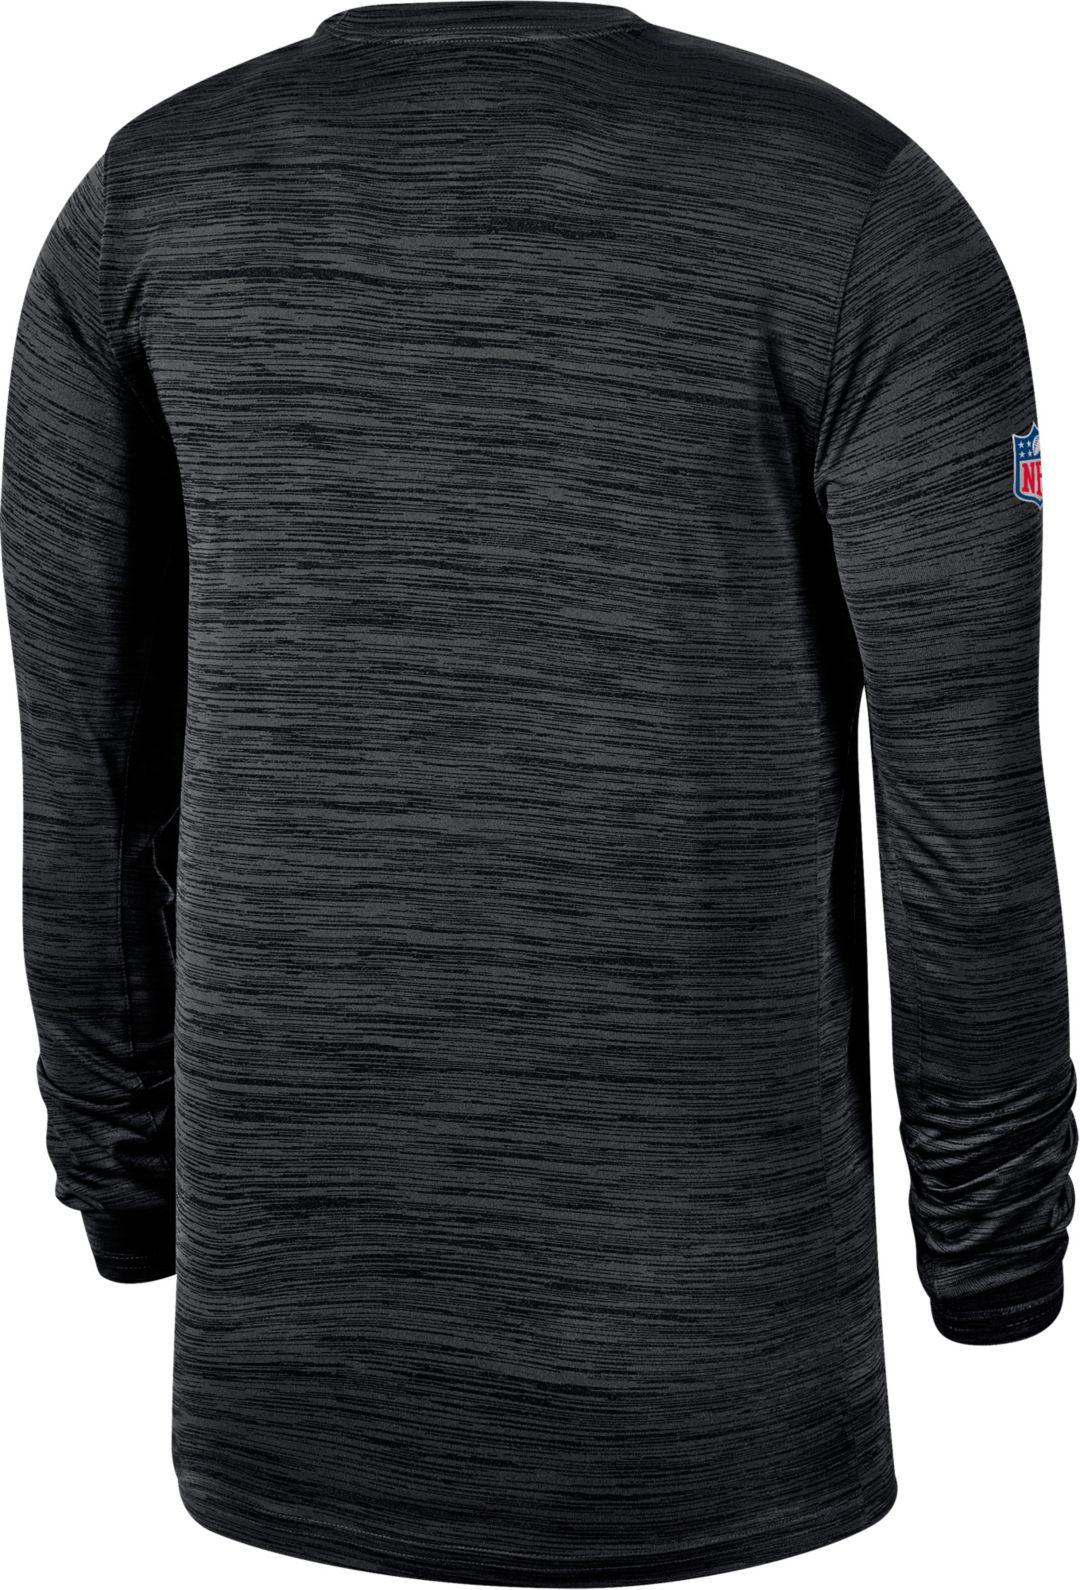 size 40 3c72c 4eff3 Nike Men's Pittsburgh Steelers Sideline Legend Velocity Black Long Sleeve  Shirt